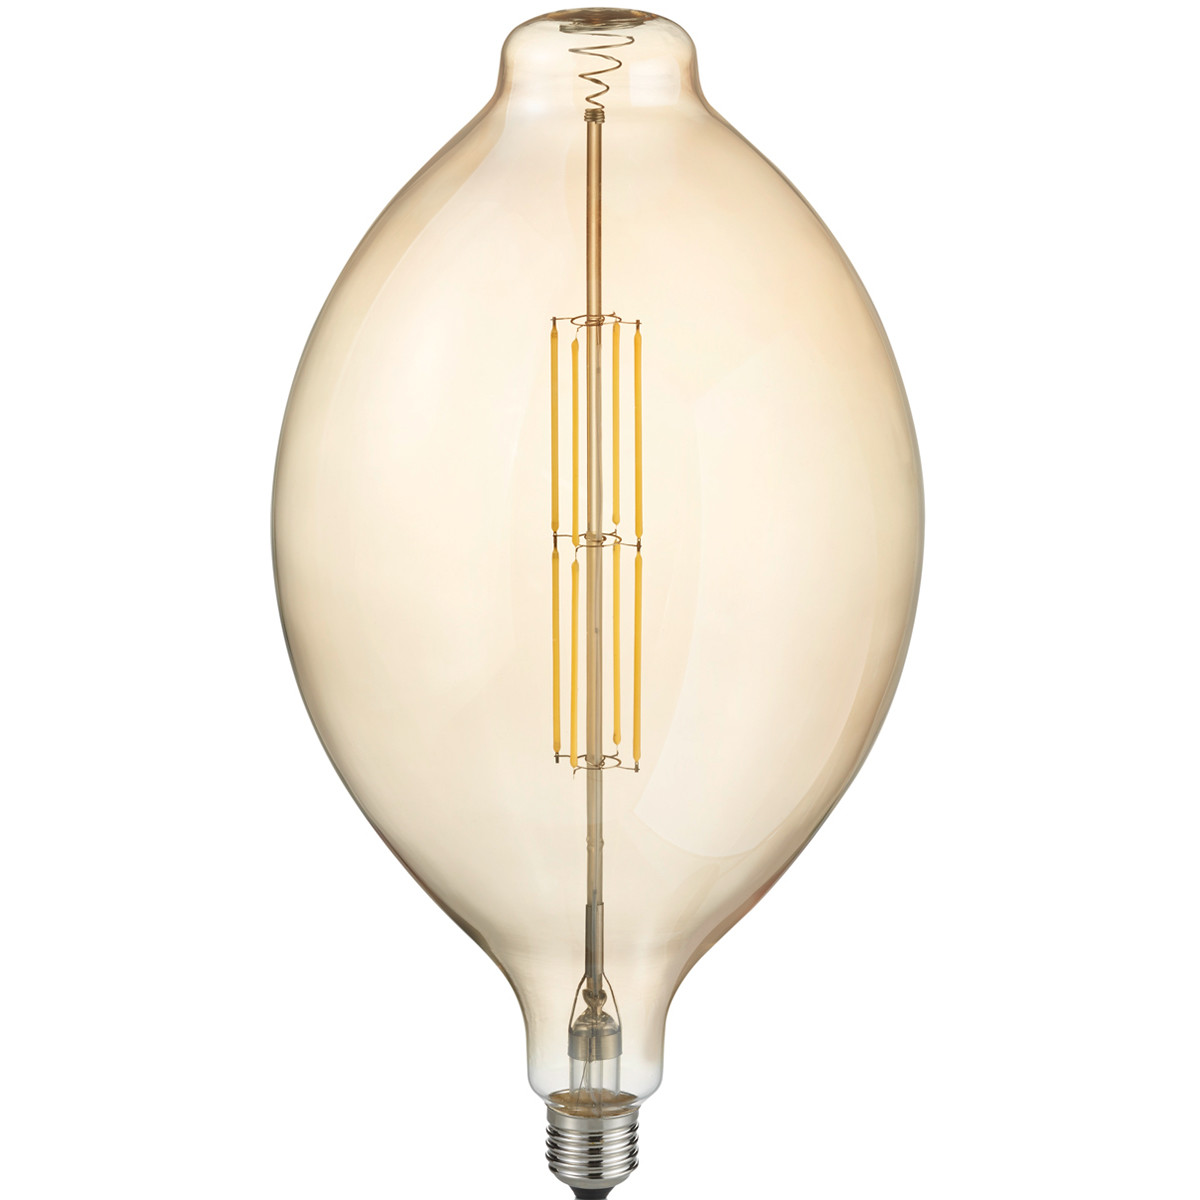 LED Lamp - Design - Trion Tropy - Dimbaar - E27 Fitting - Amber - 8W - Warm Wit 2700K